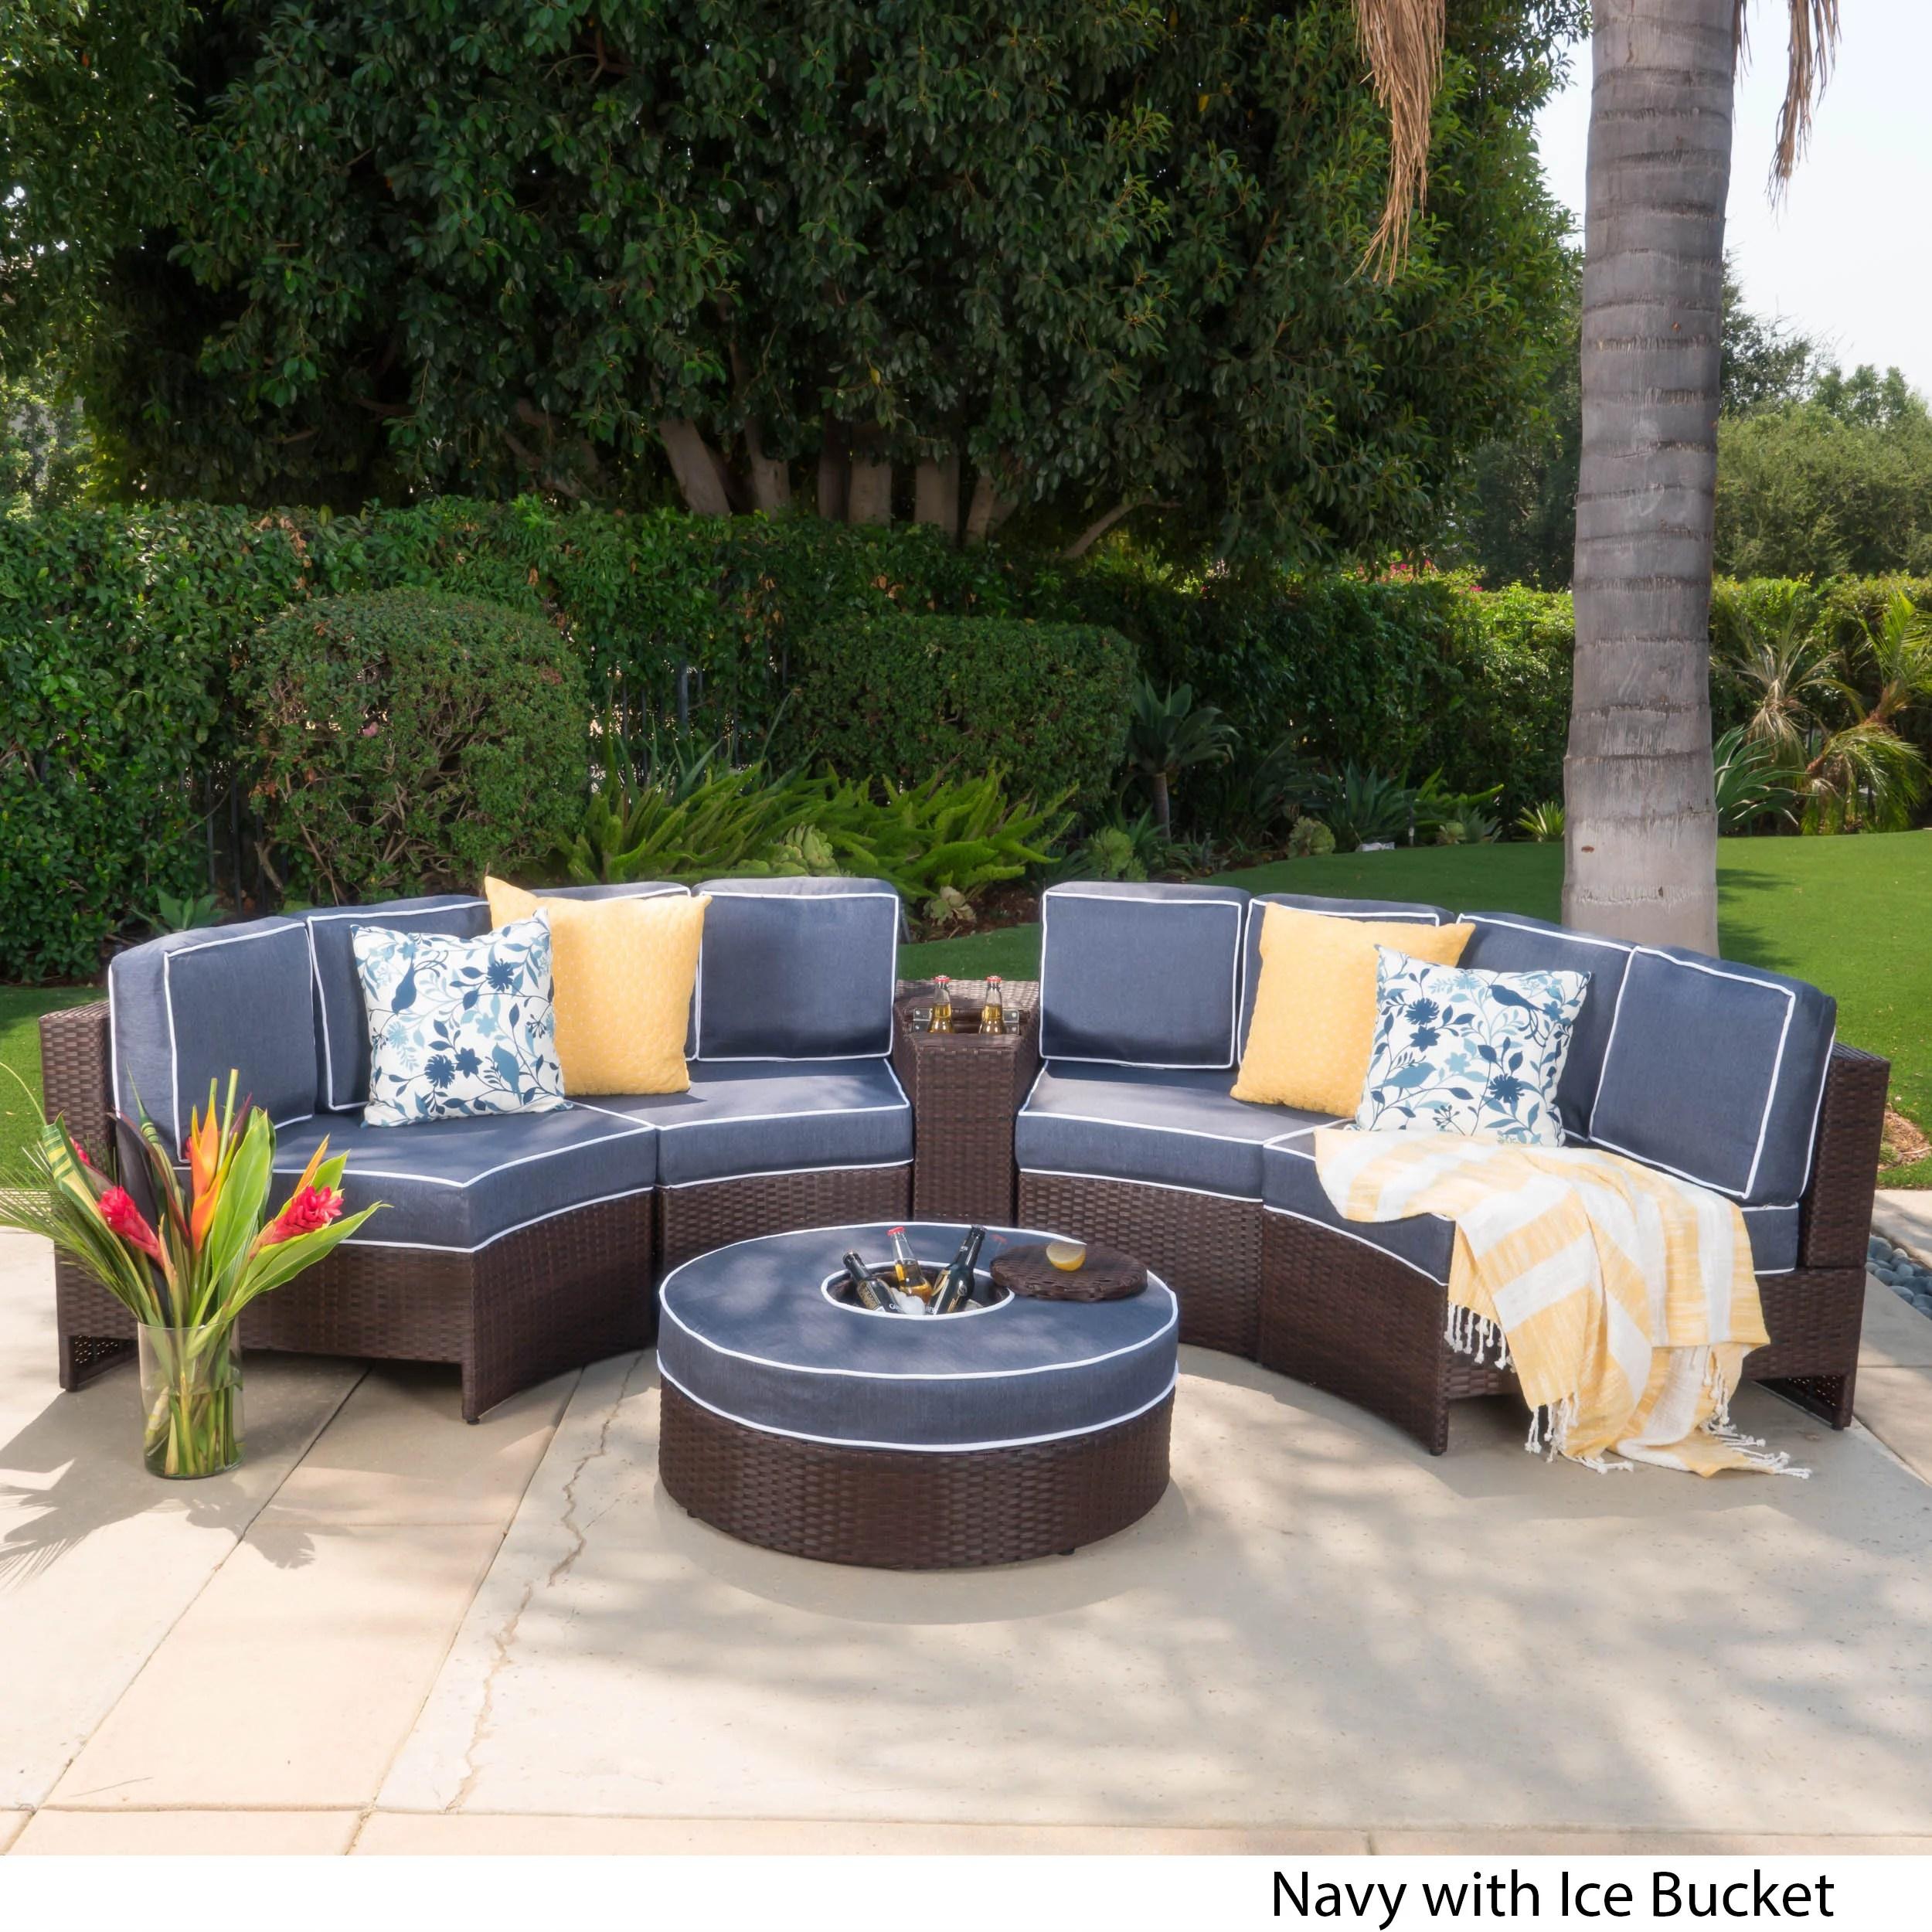 riviera portofino wicker 6 piece semicircular sectional sofa seating set with cushions and ice bucket ottoman navy walmart com